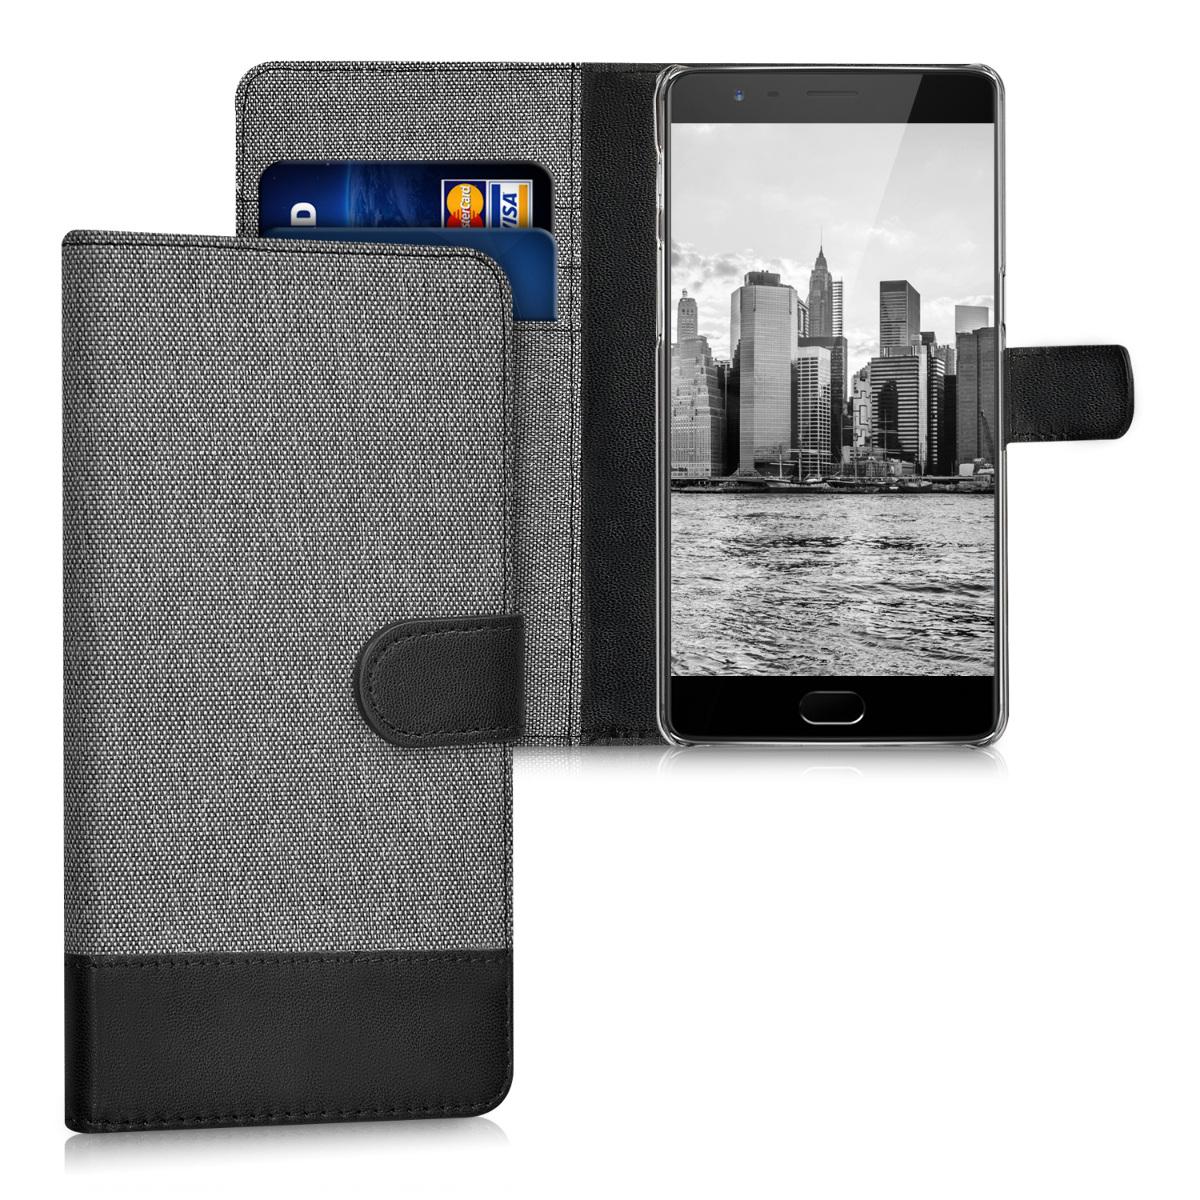 KW Θήκη Πορτοφόλι OnePlus 3 / 3T - Grey / Black (38833.22)